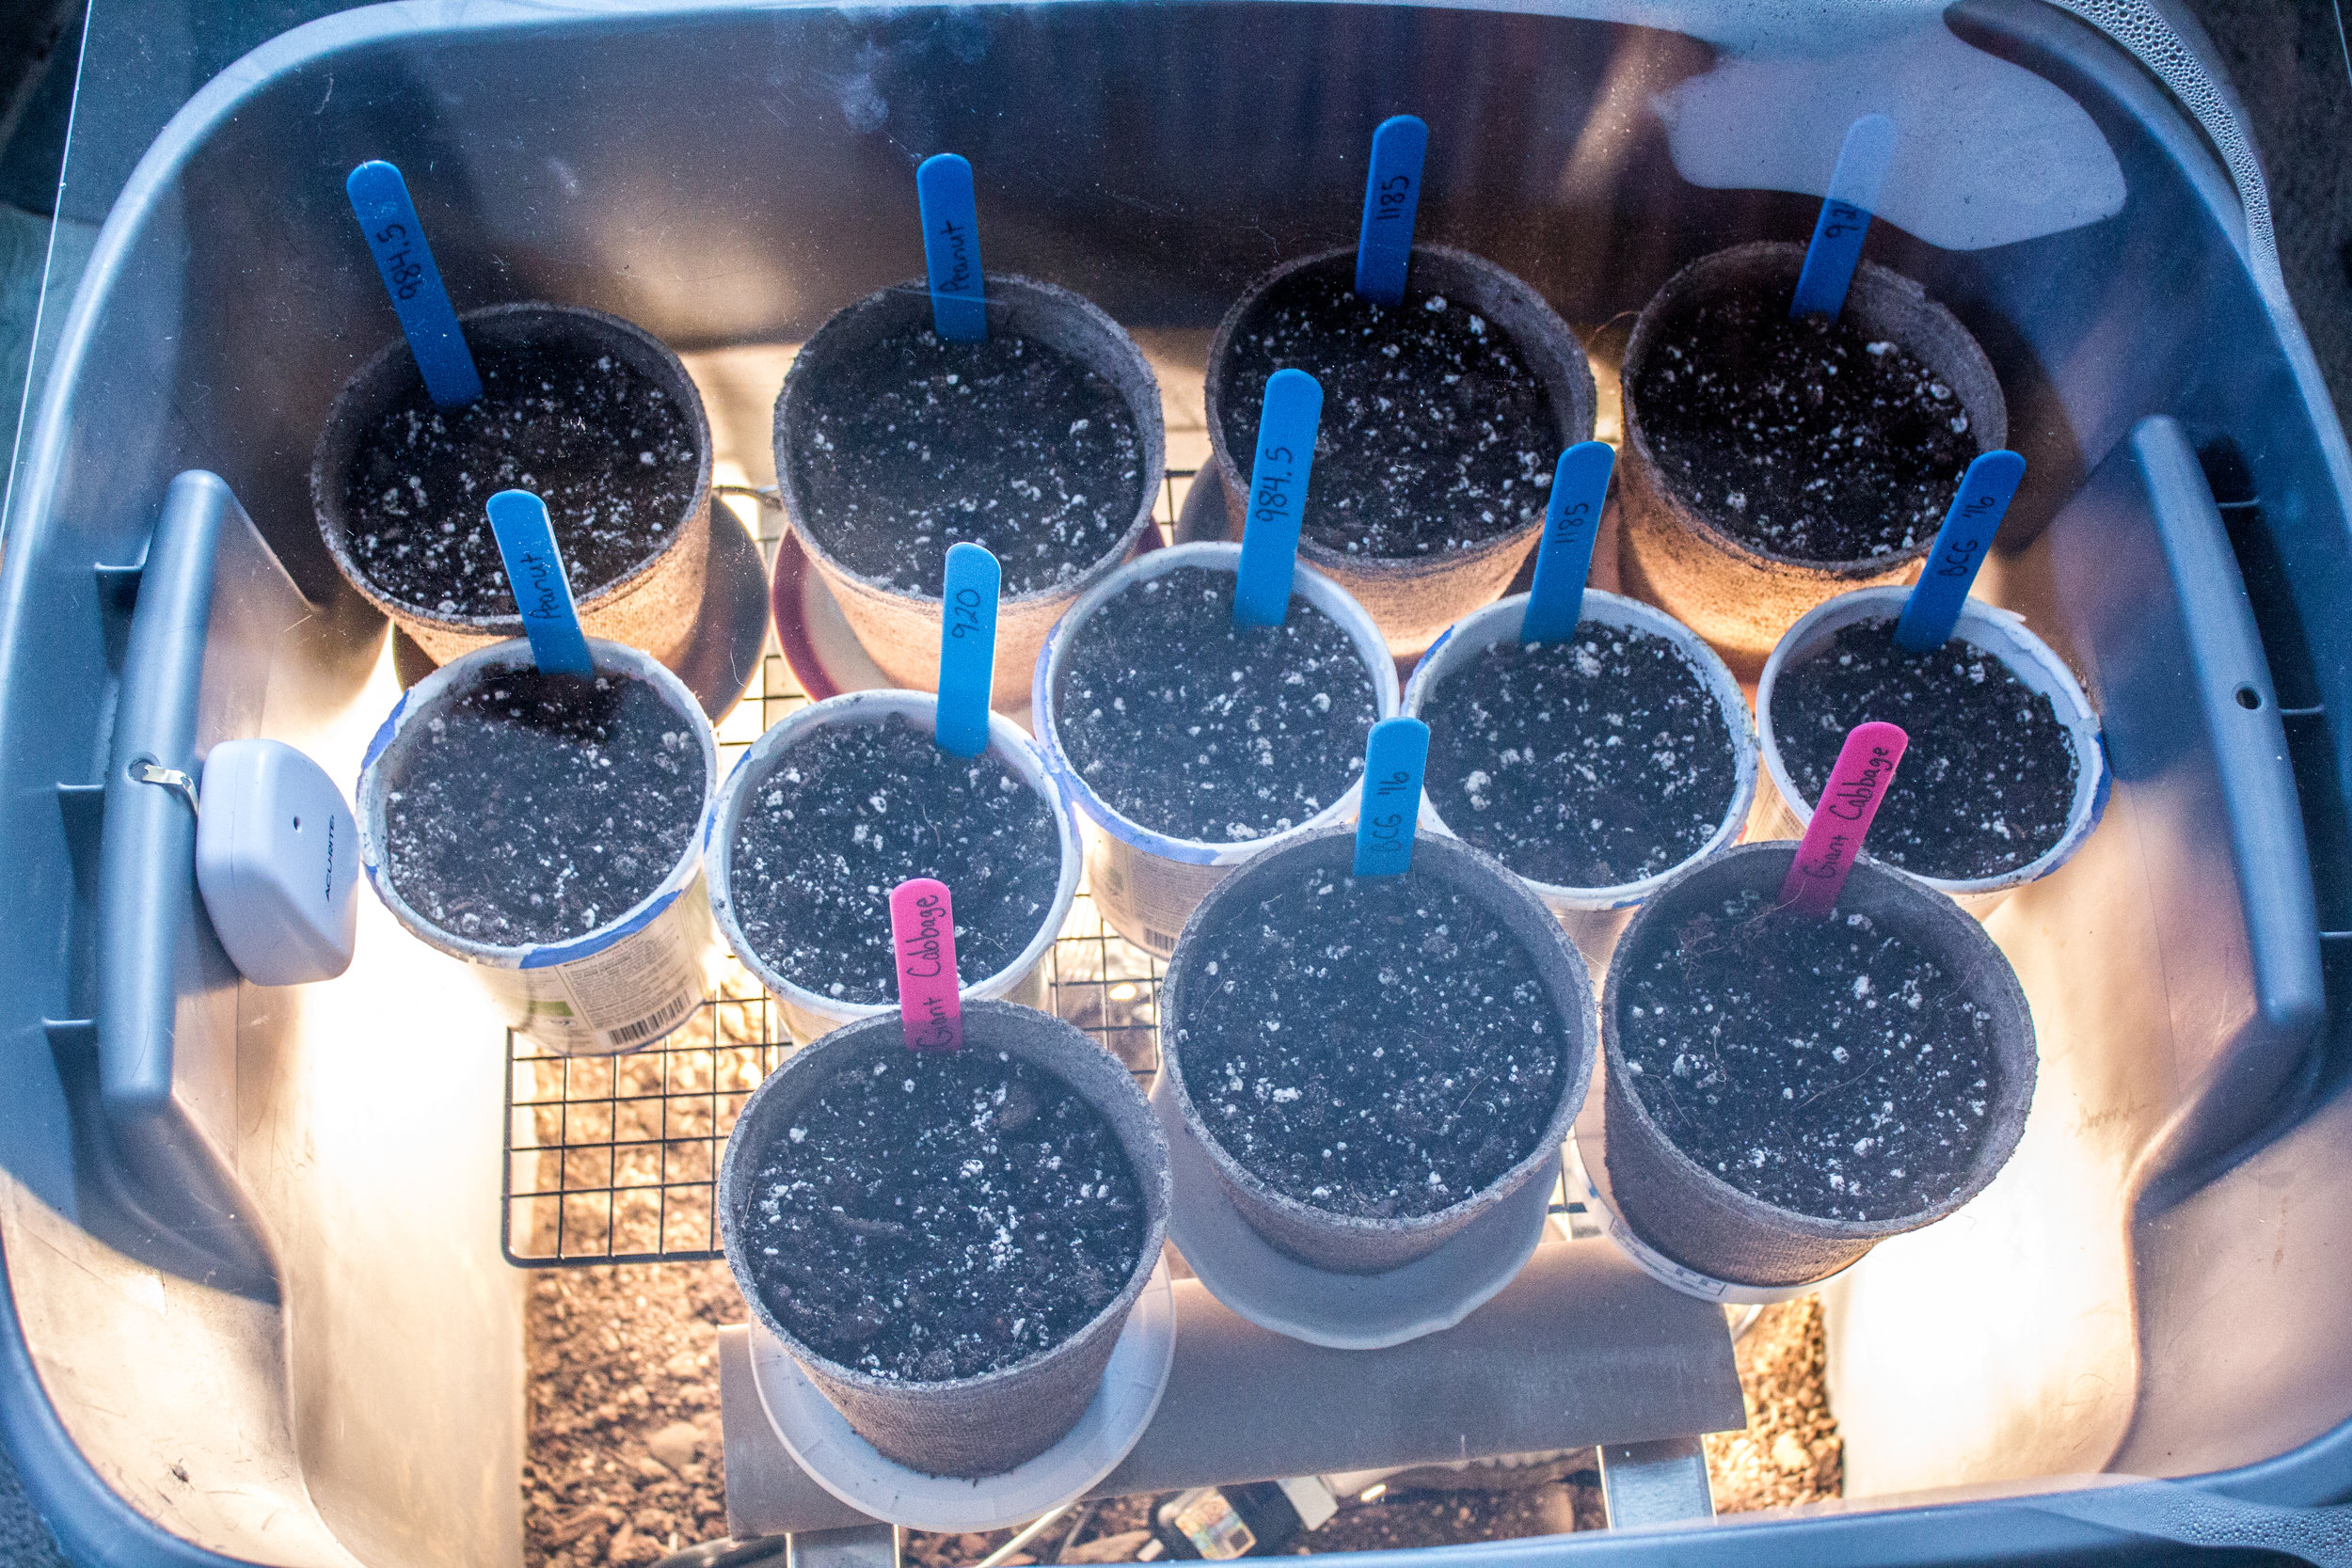 My homemade germination chamber.